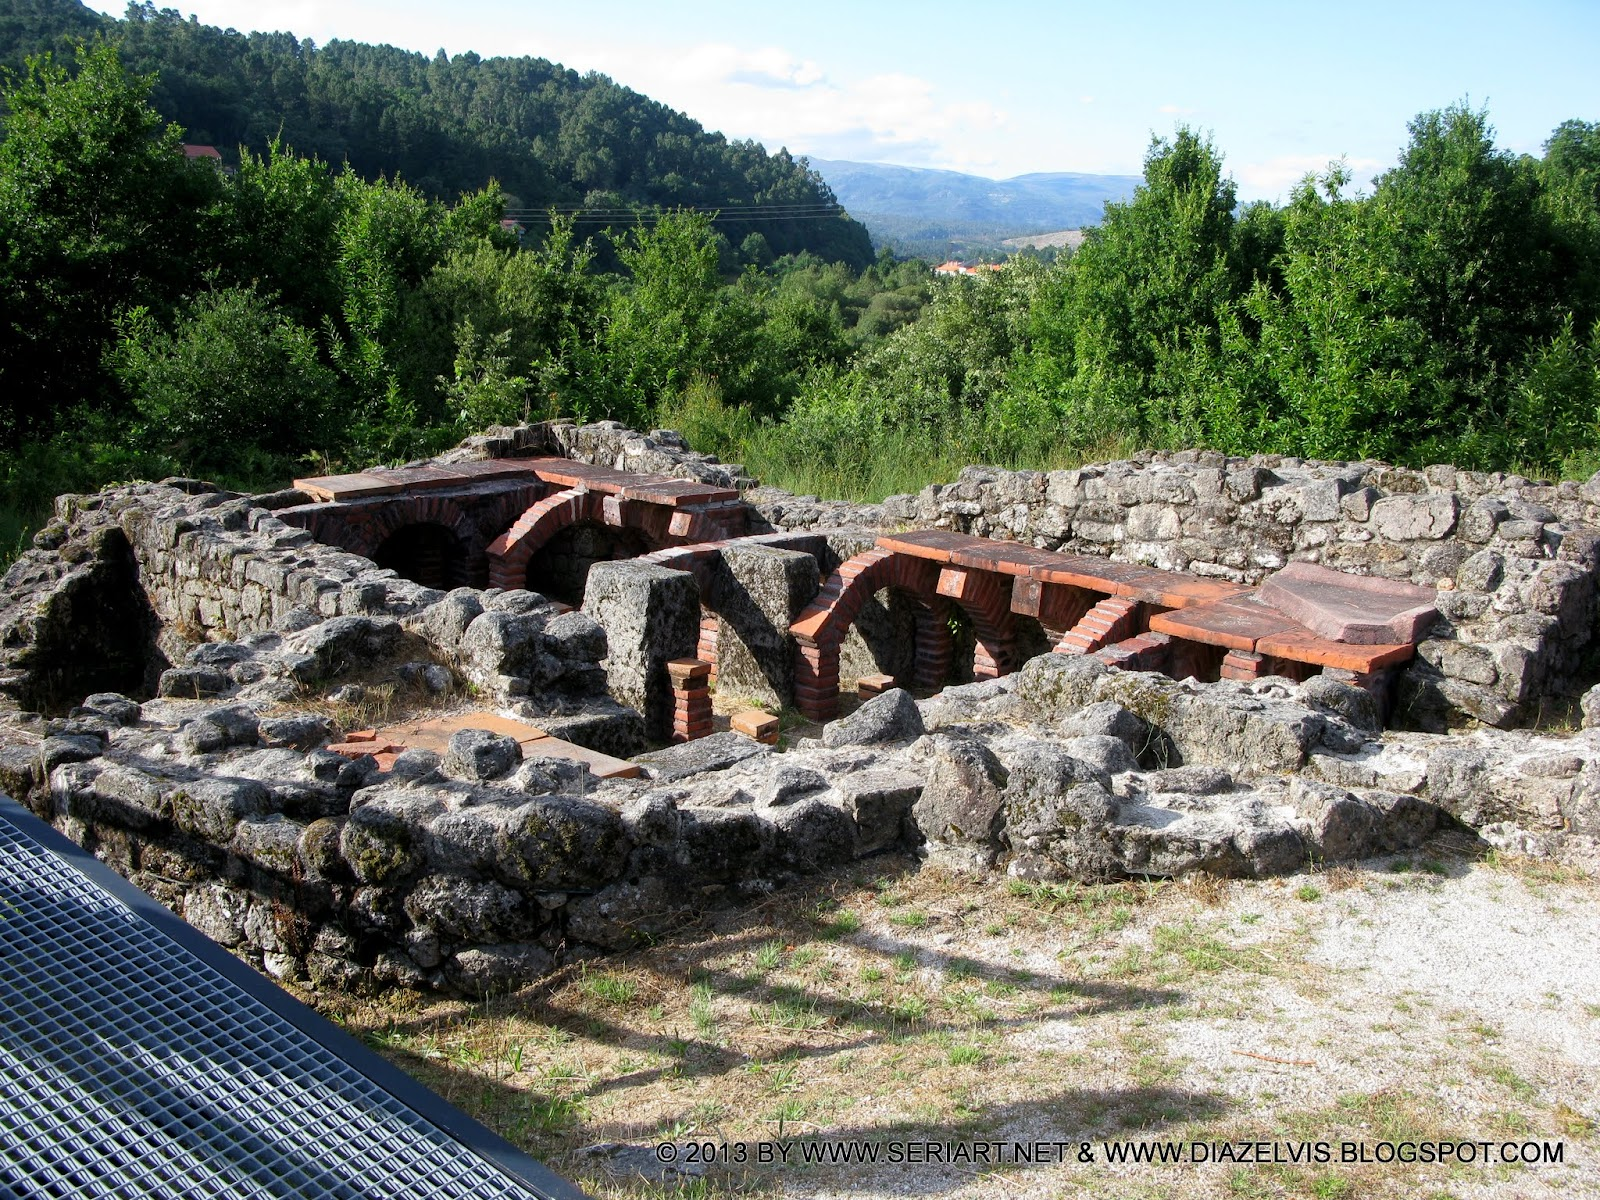 Baños Romanos De Bande:Romano de Aquis Originis – Fontes Termais e Área de Baño de